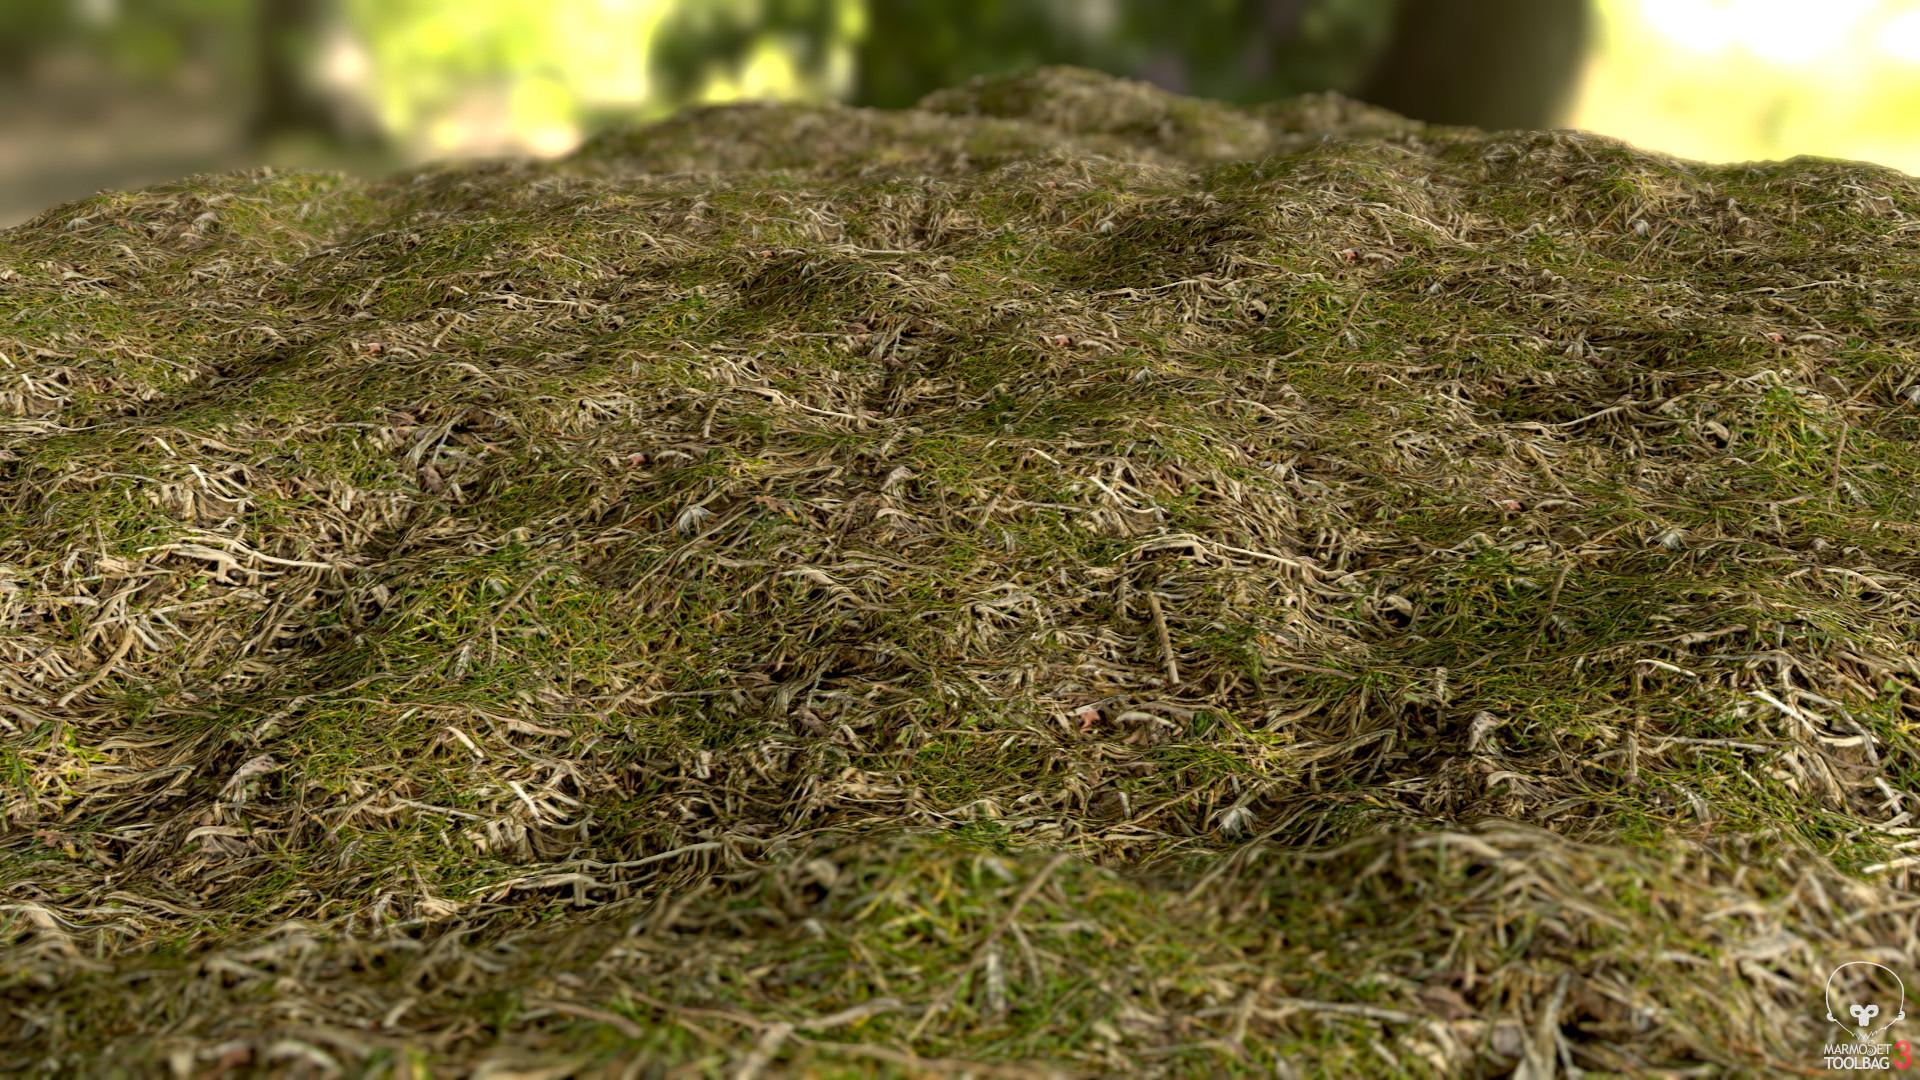 Dave riganelli grass2